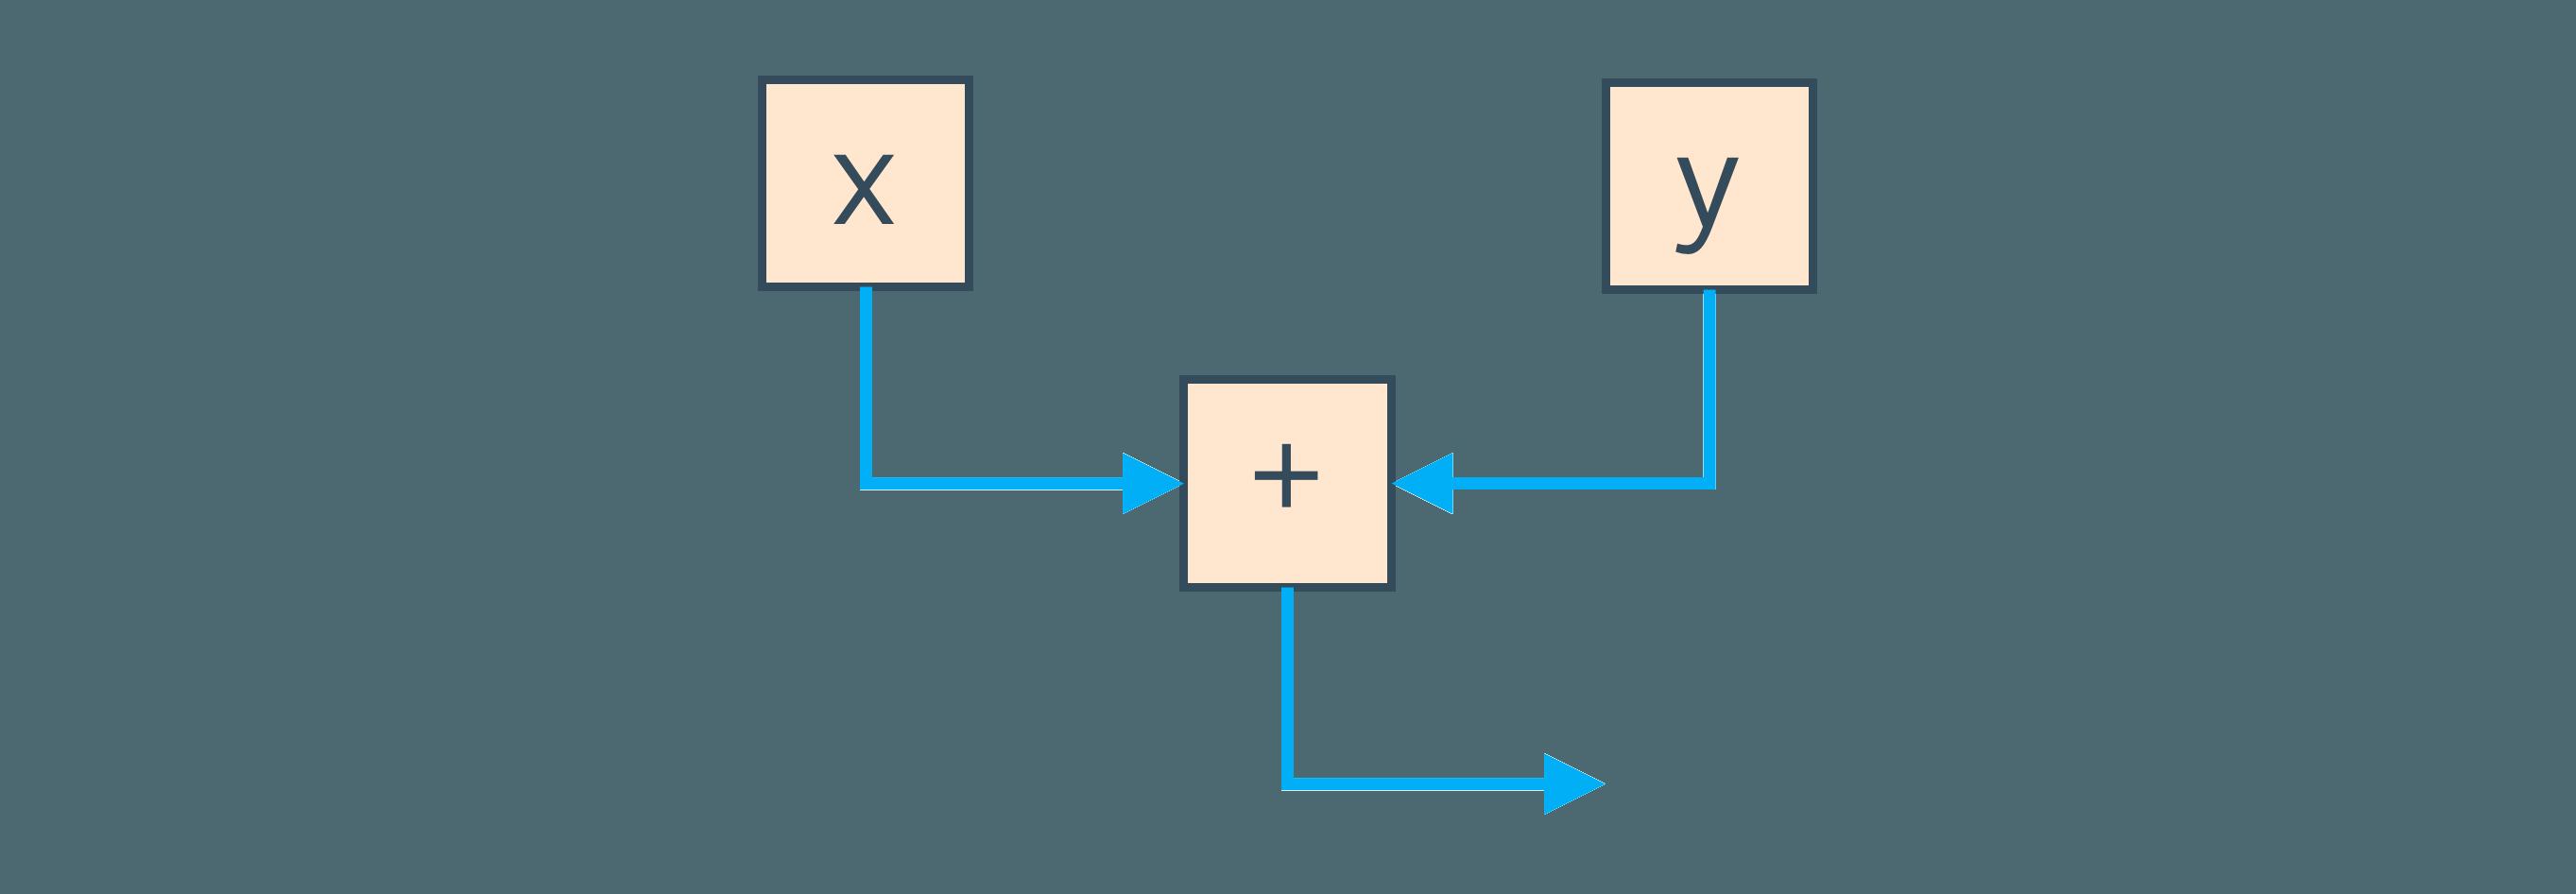 Deep Dive Into the New Java JIT Compiler - Graal | Baeldung